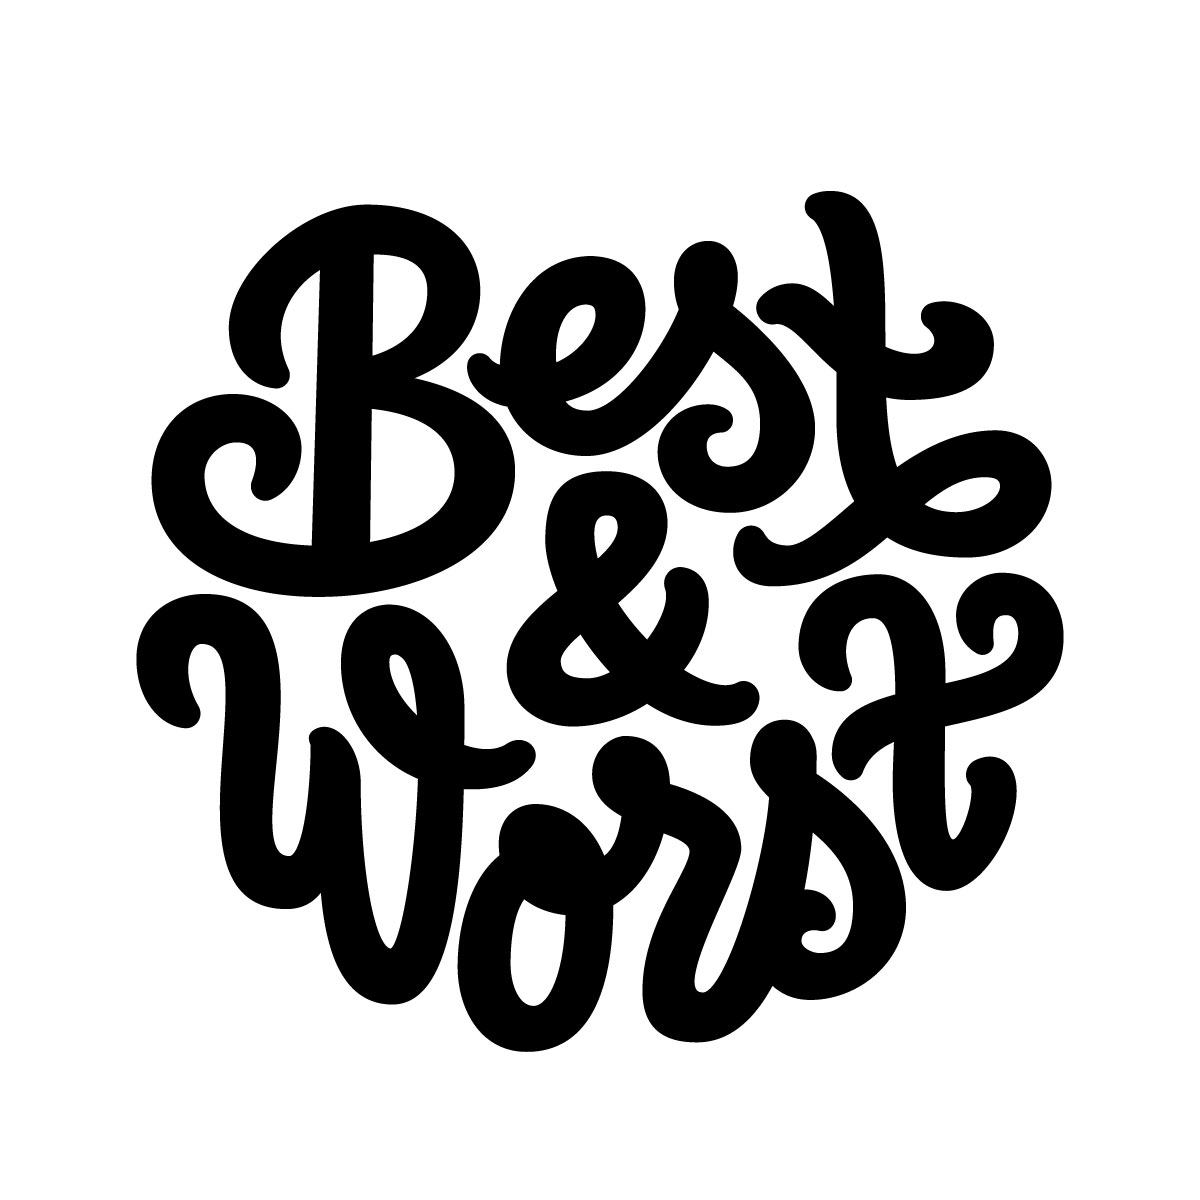 Richmond-magazine-best-and-worst-lettering-process-3.jpg